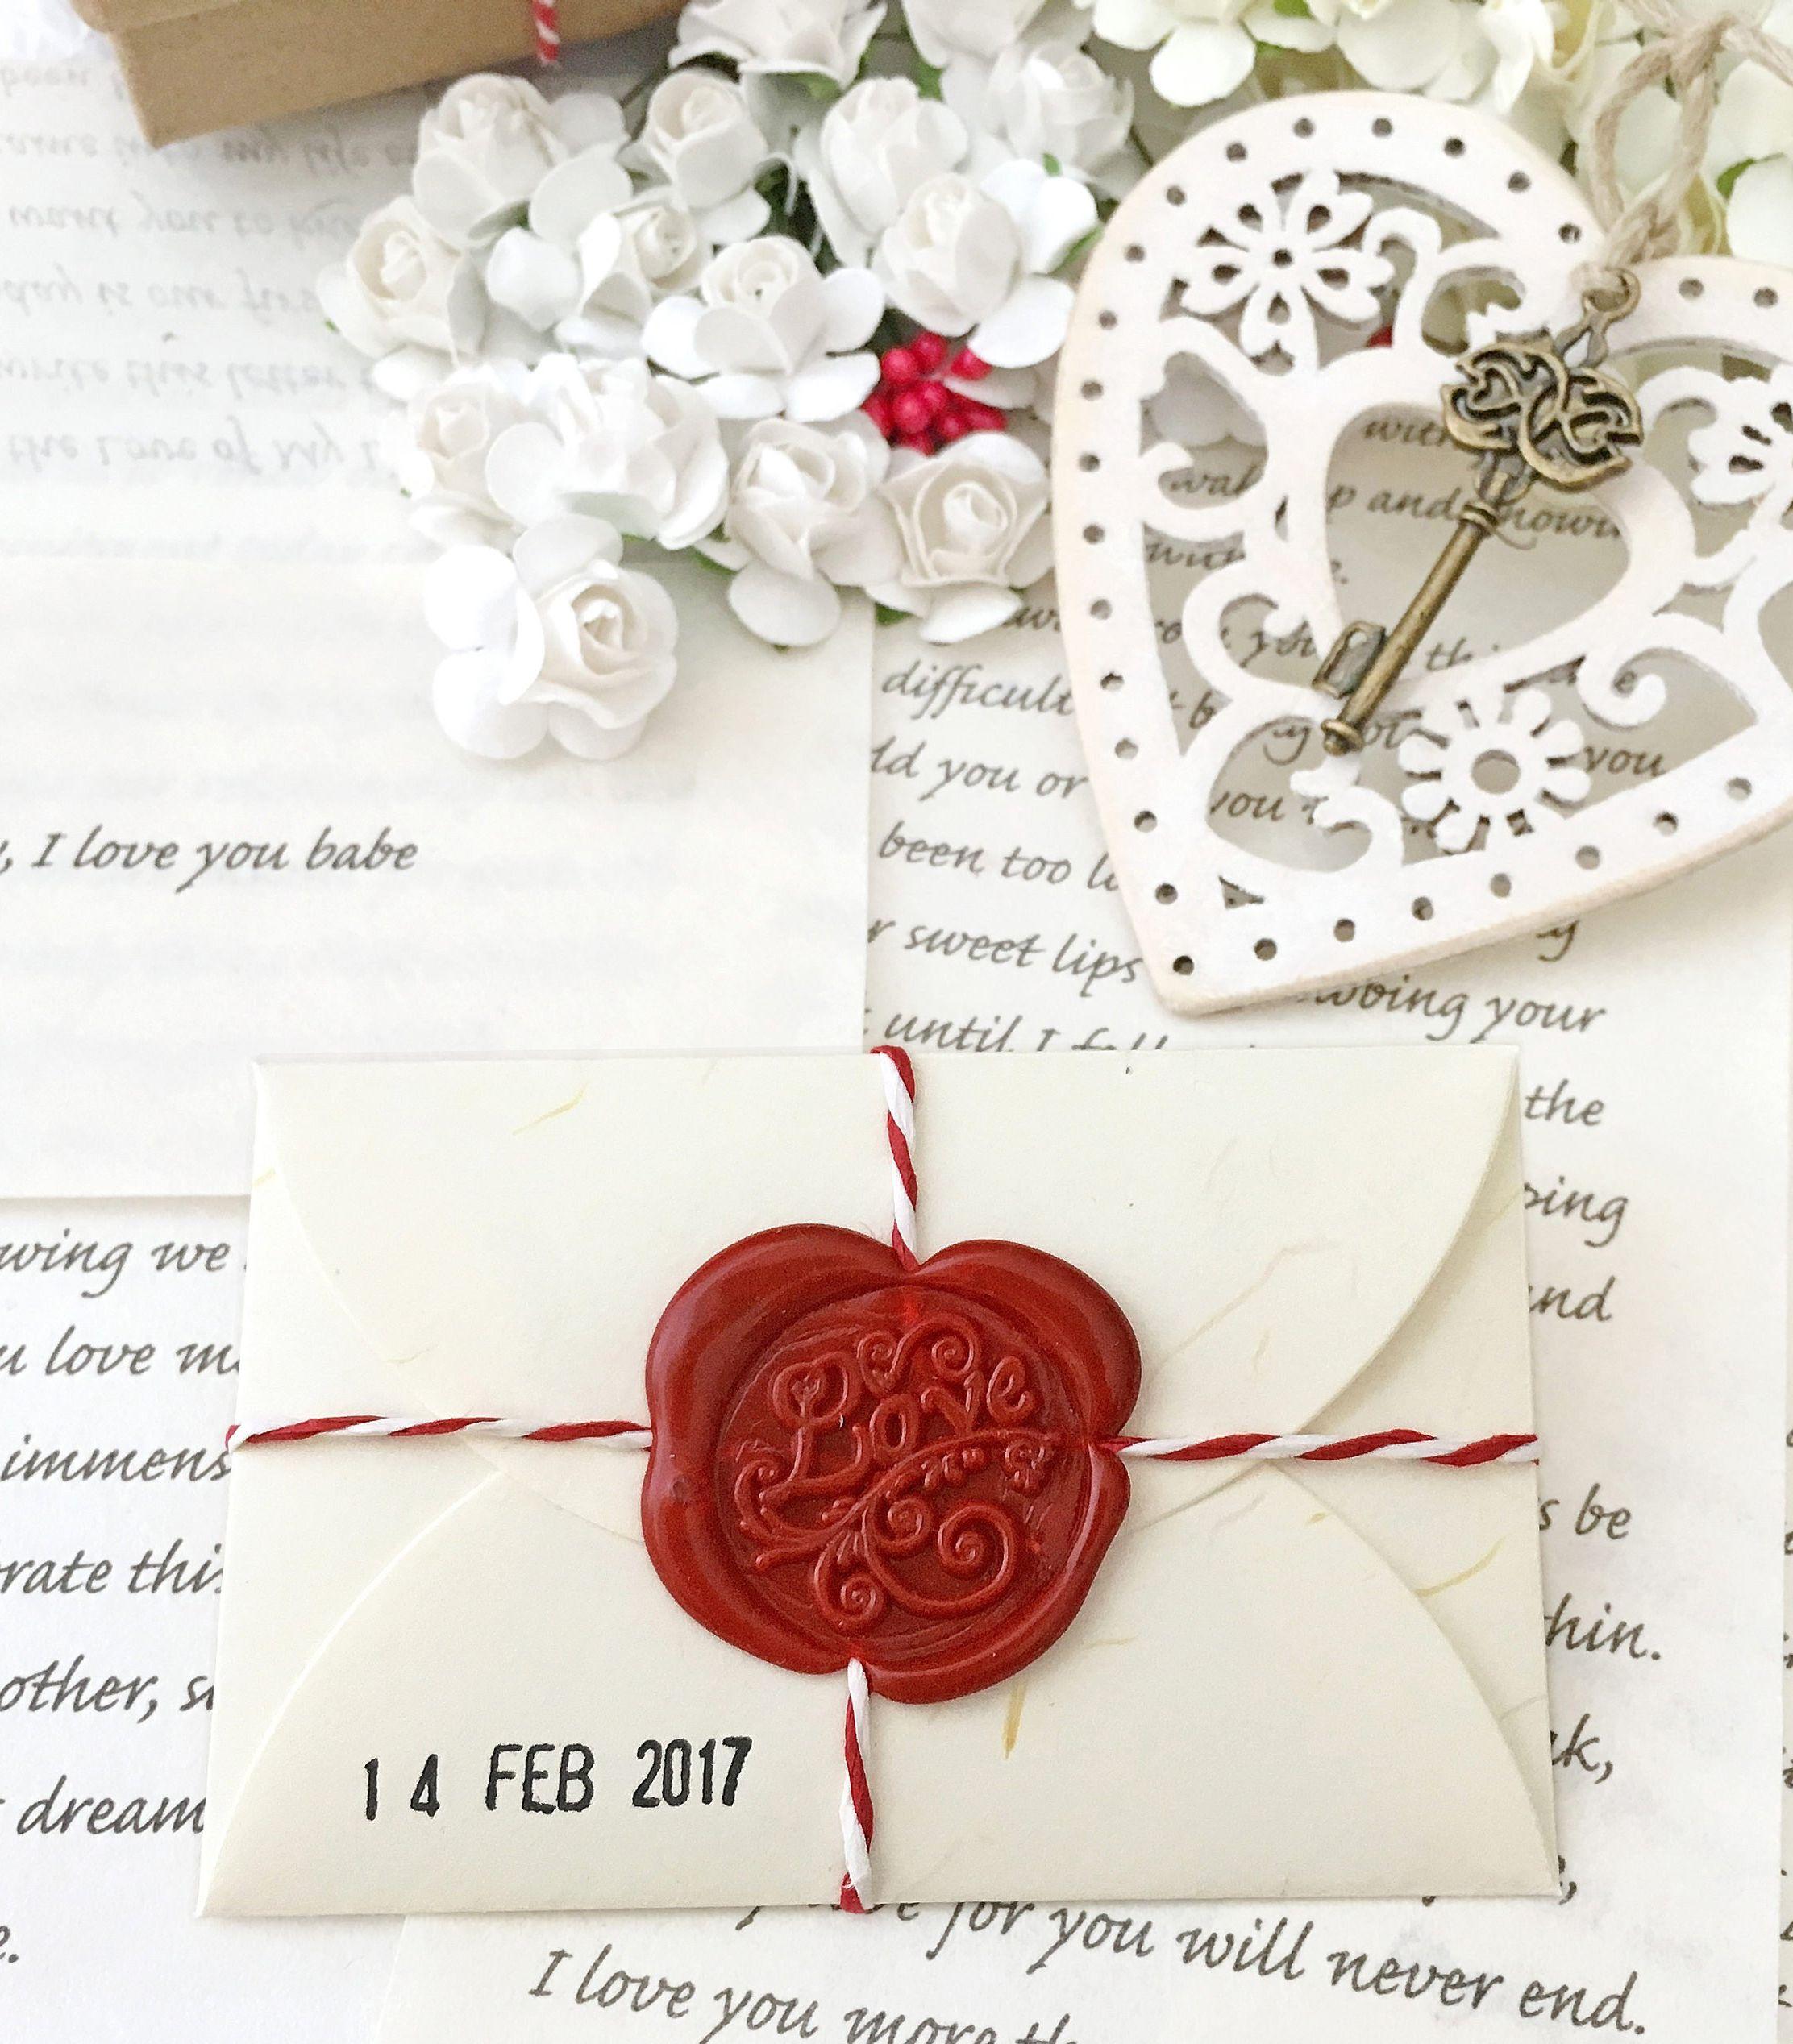 6 month dating anniversary gift romantic present